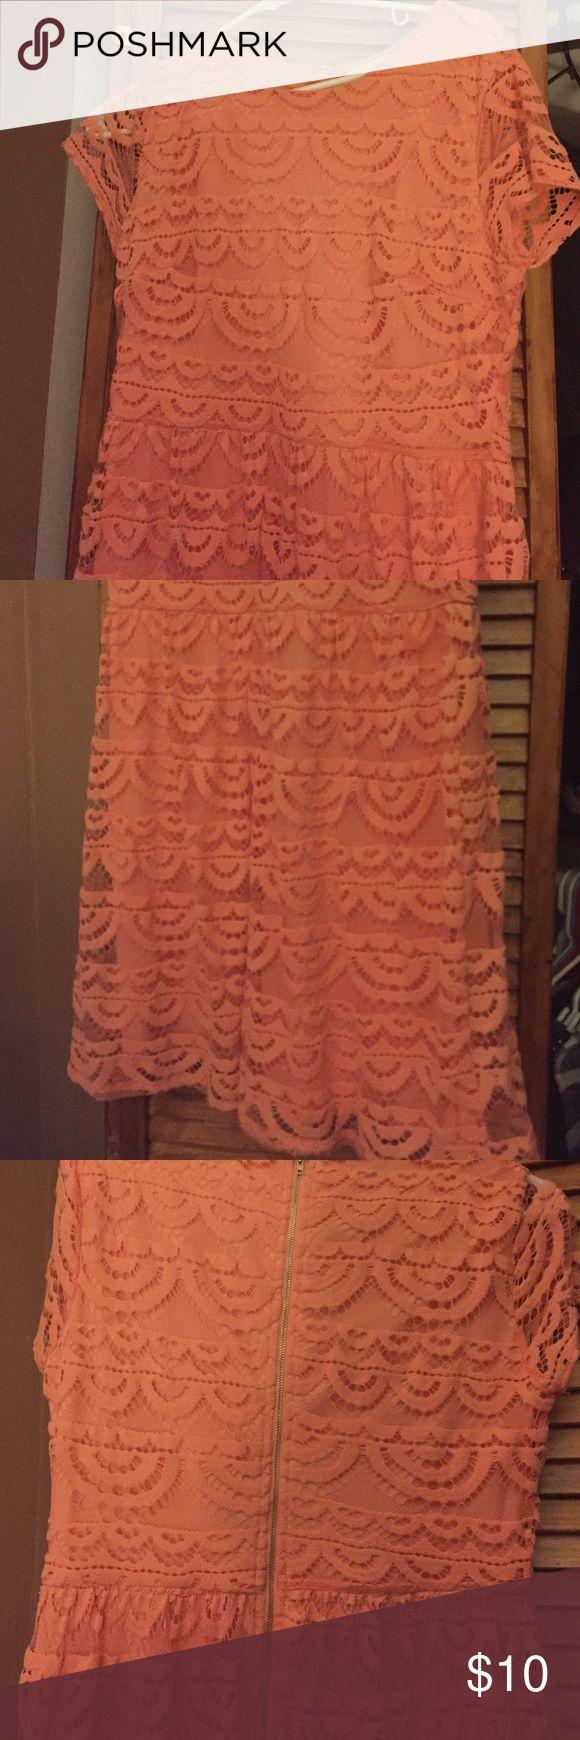 Peach lace dress Francesca's short peach lace dress with back zipper detail. Worn one time! Francesca's Collections Dresses Mini